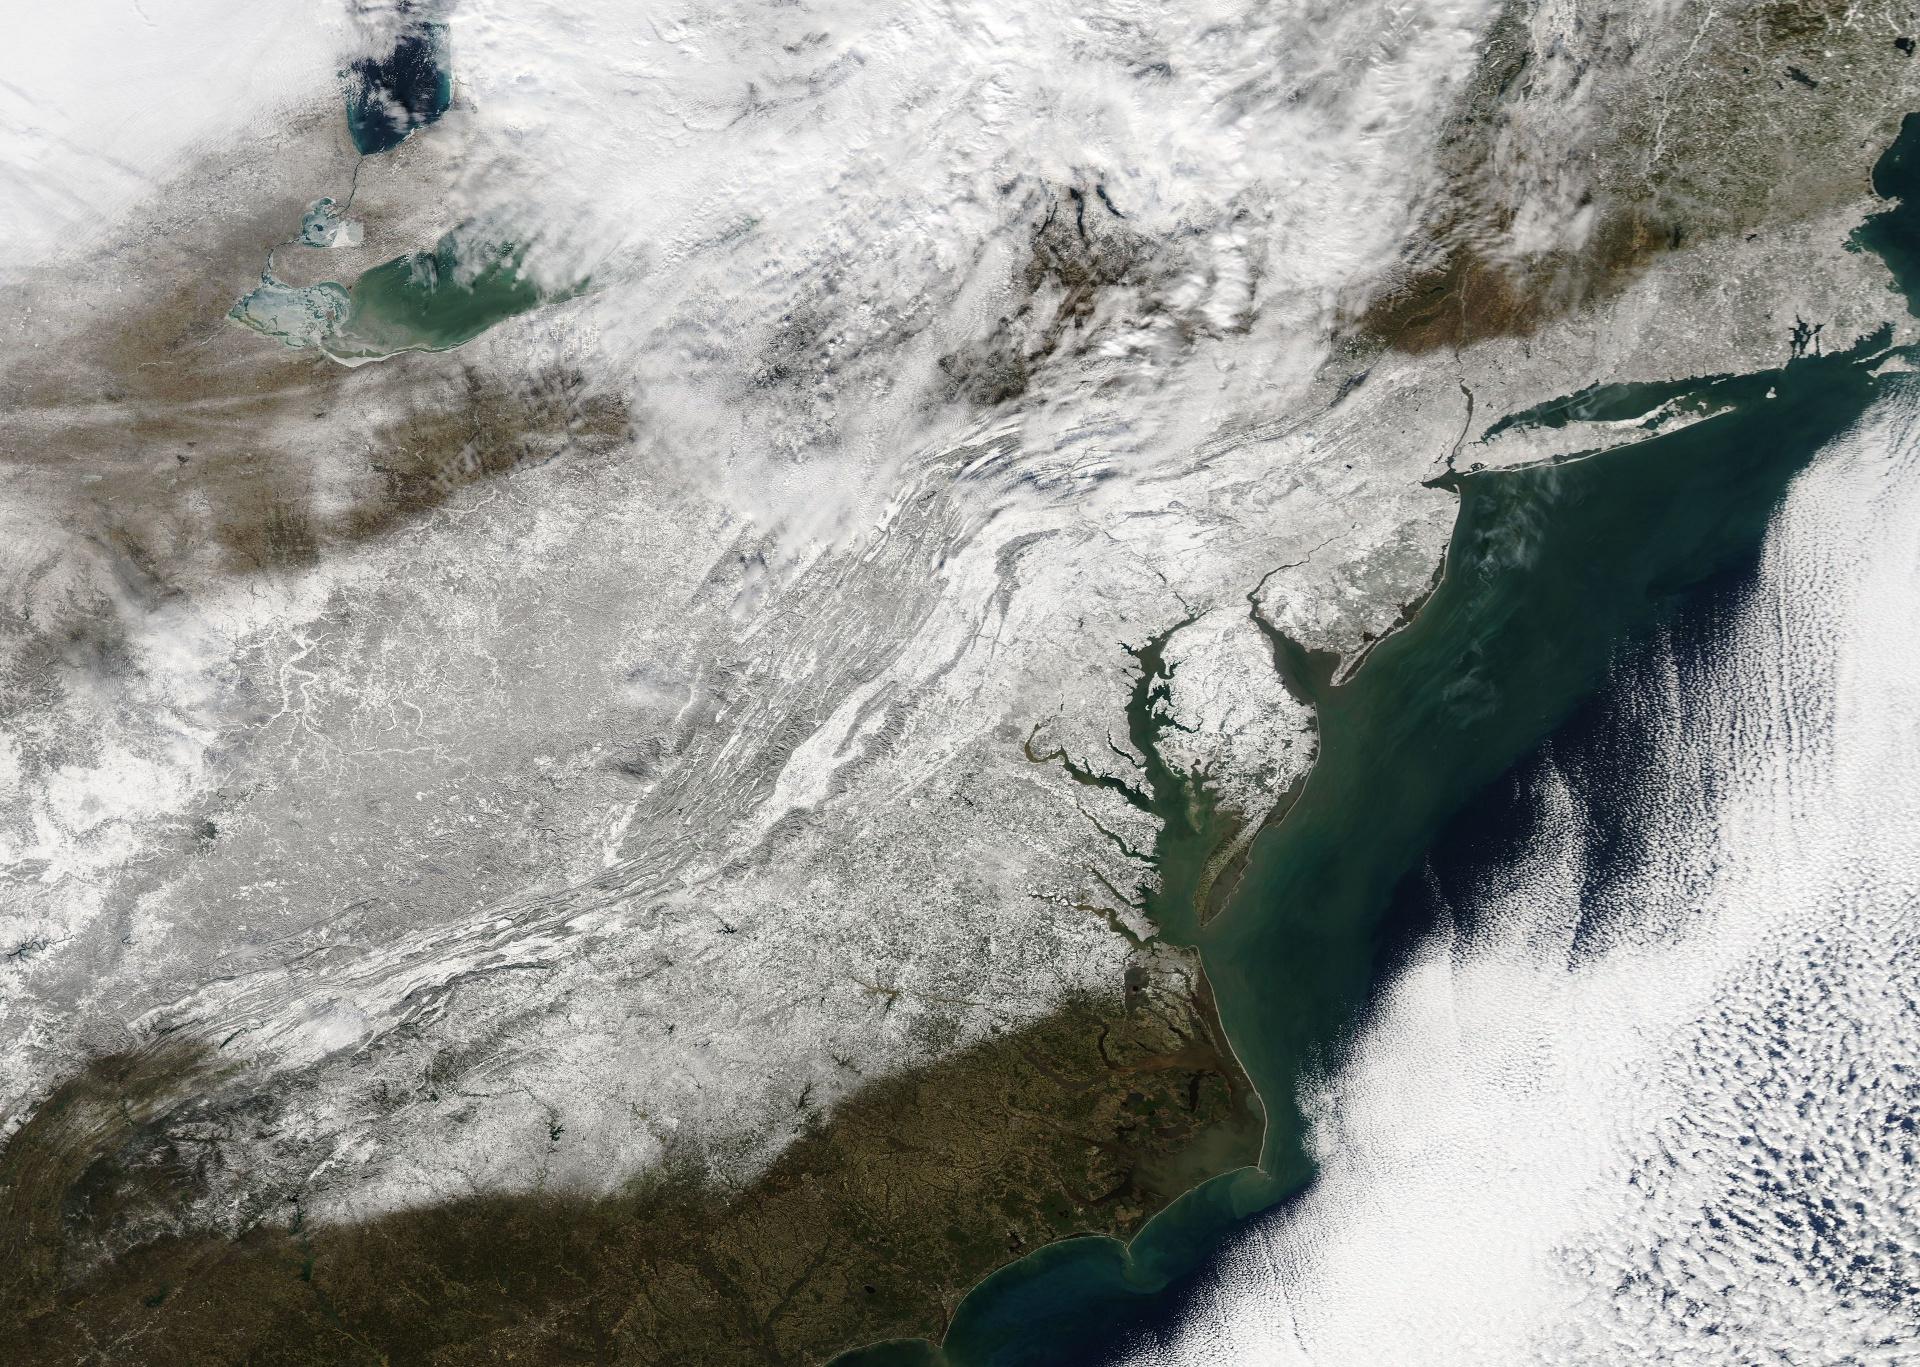 Tempête de neige - Jonas - Snowzilla - New York - Washington - côte est - Janvier 2016 - Aqua - MODIS - NASA